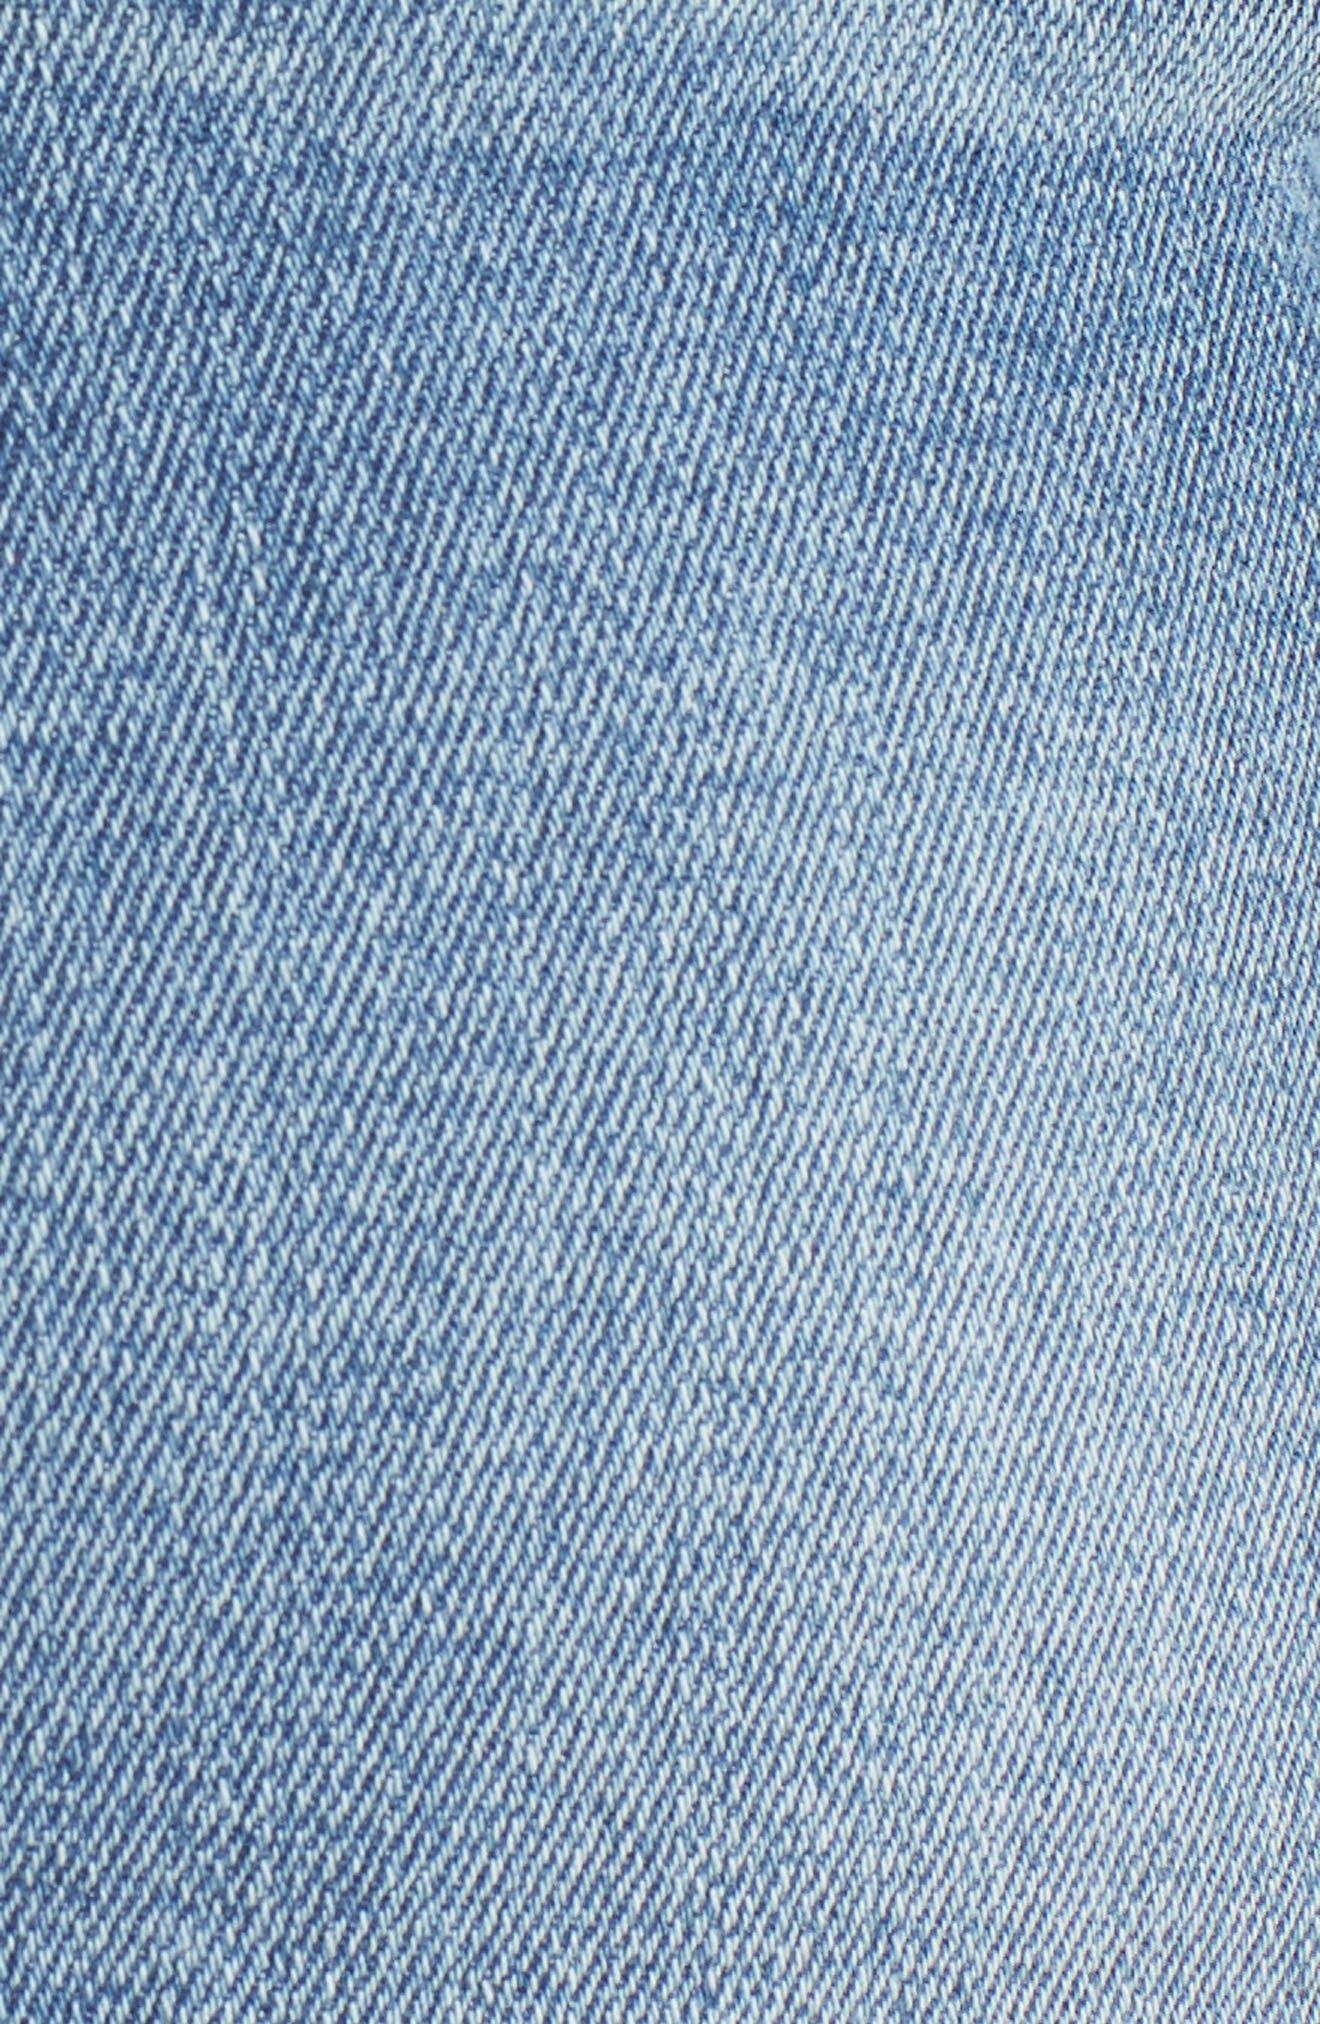 Ab-solution Denim Bermuda Shorts,                             Alternate thumbnail 5, color,                             Light Blue